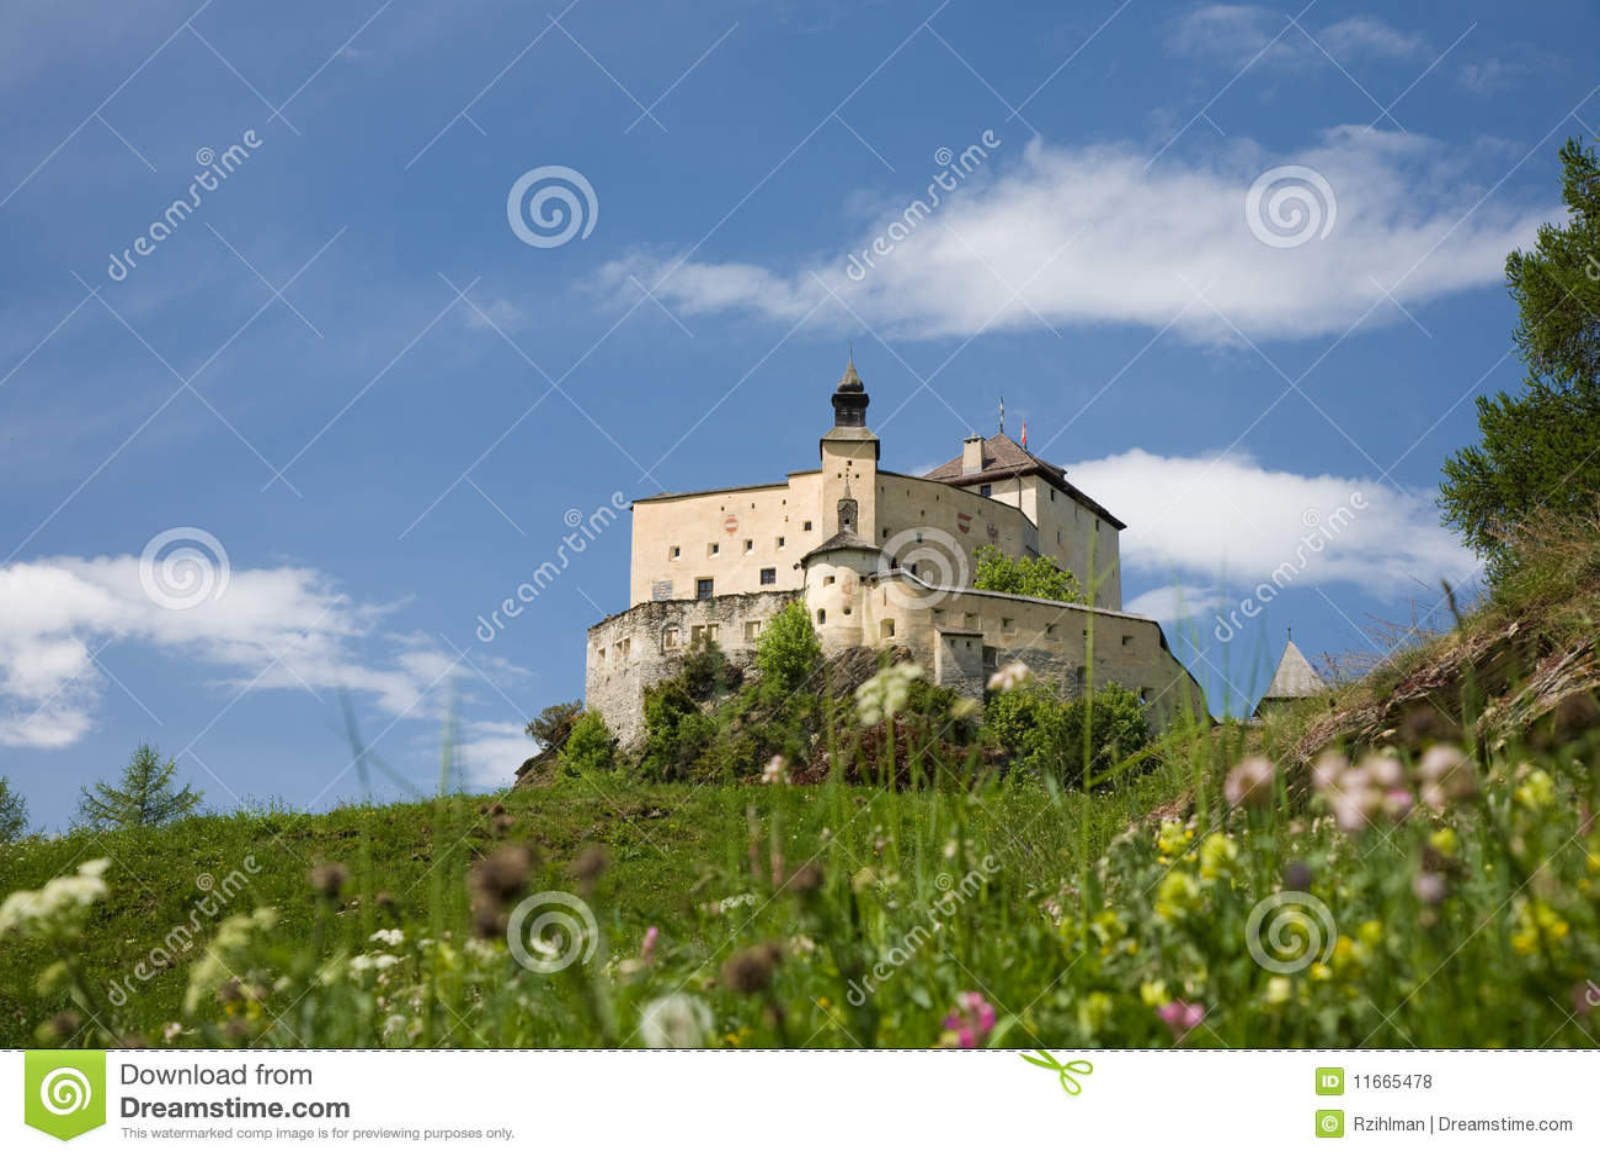 Castle of Tarasp